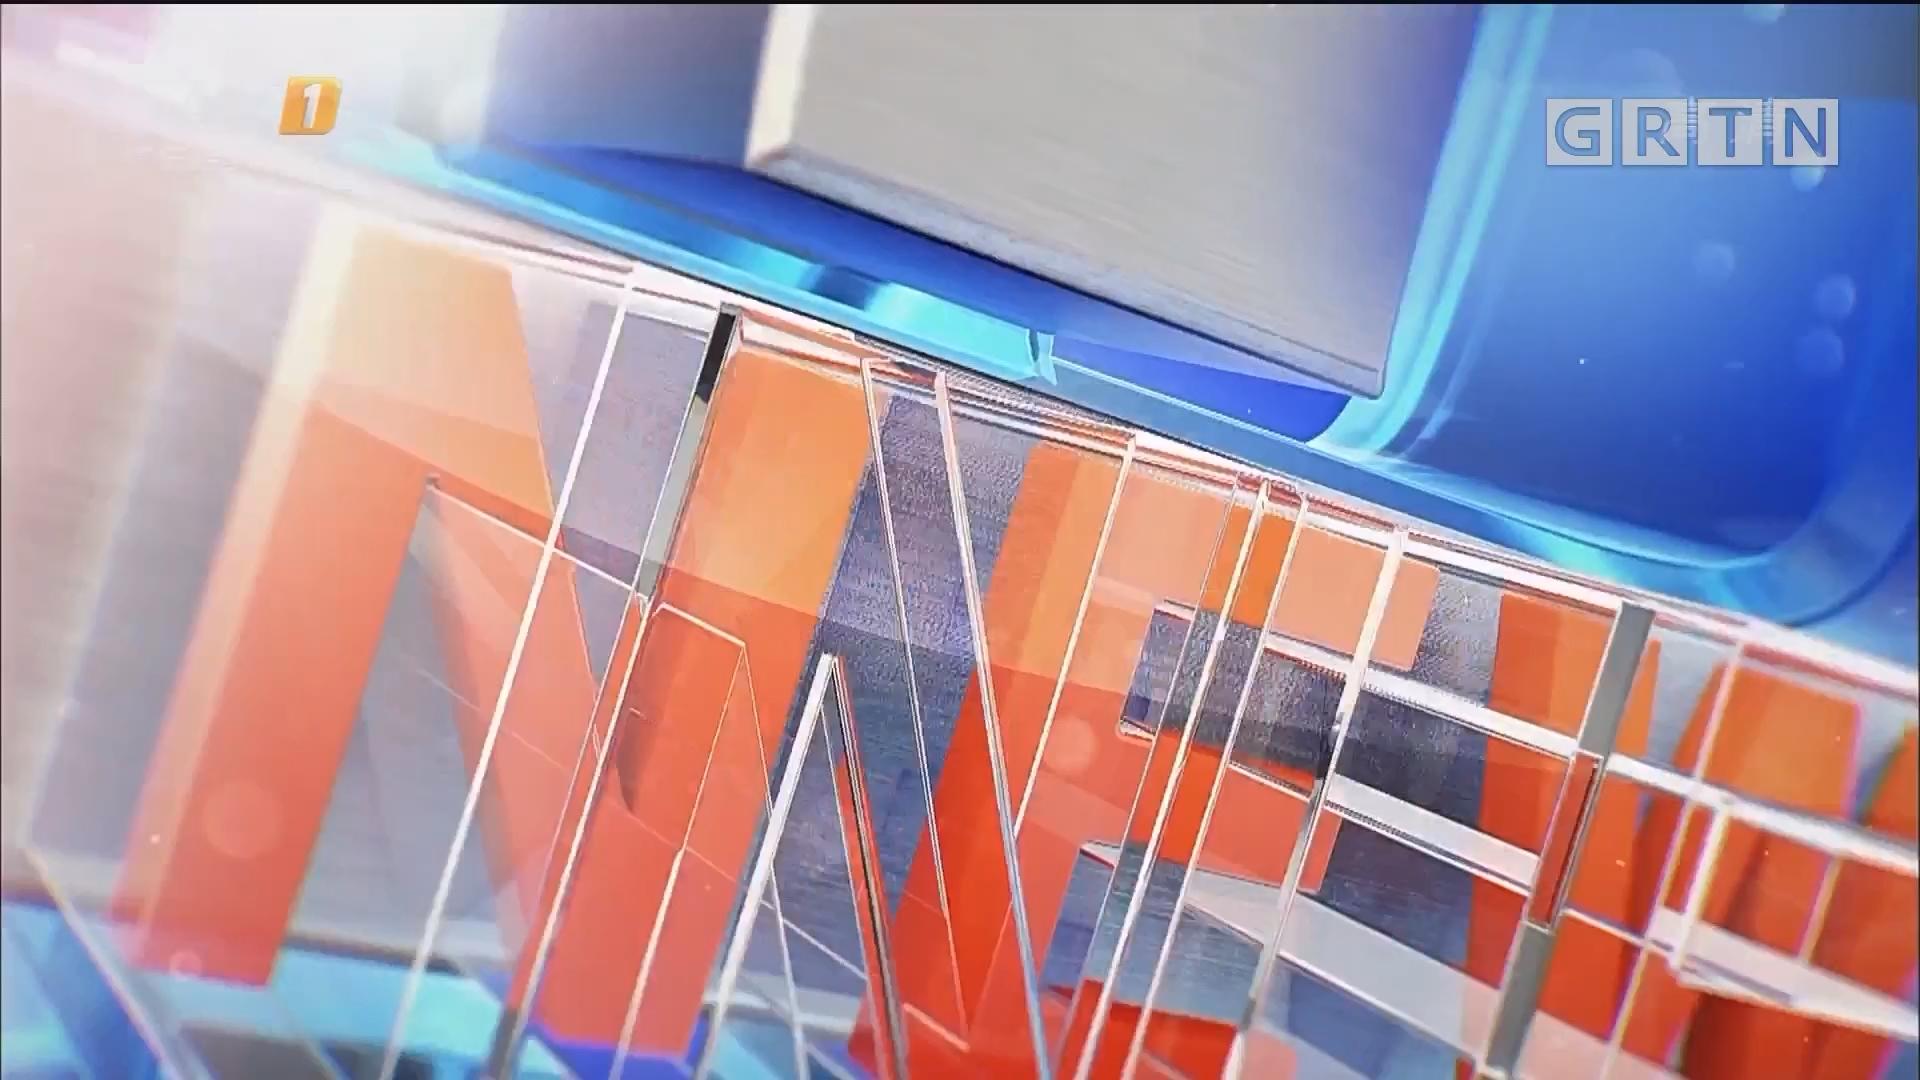 [HD][2019-07-30]南方财经报道:进博会倒计时99天 61国确认参展